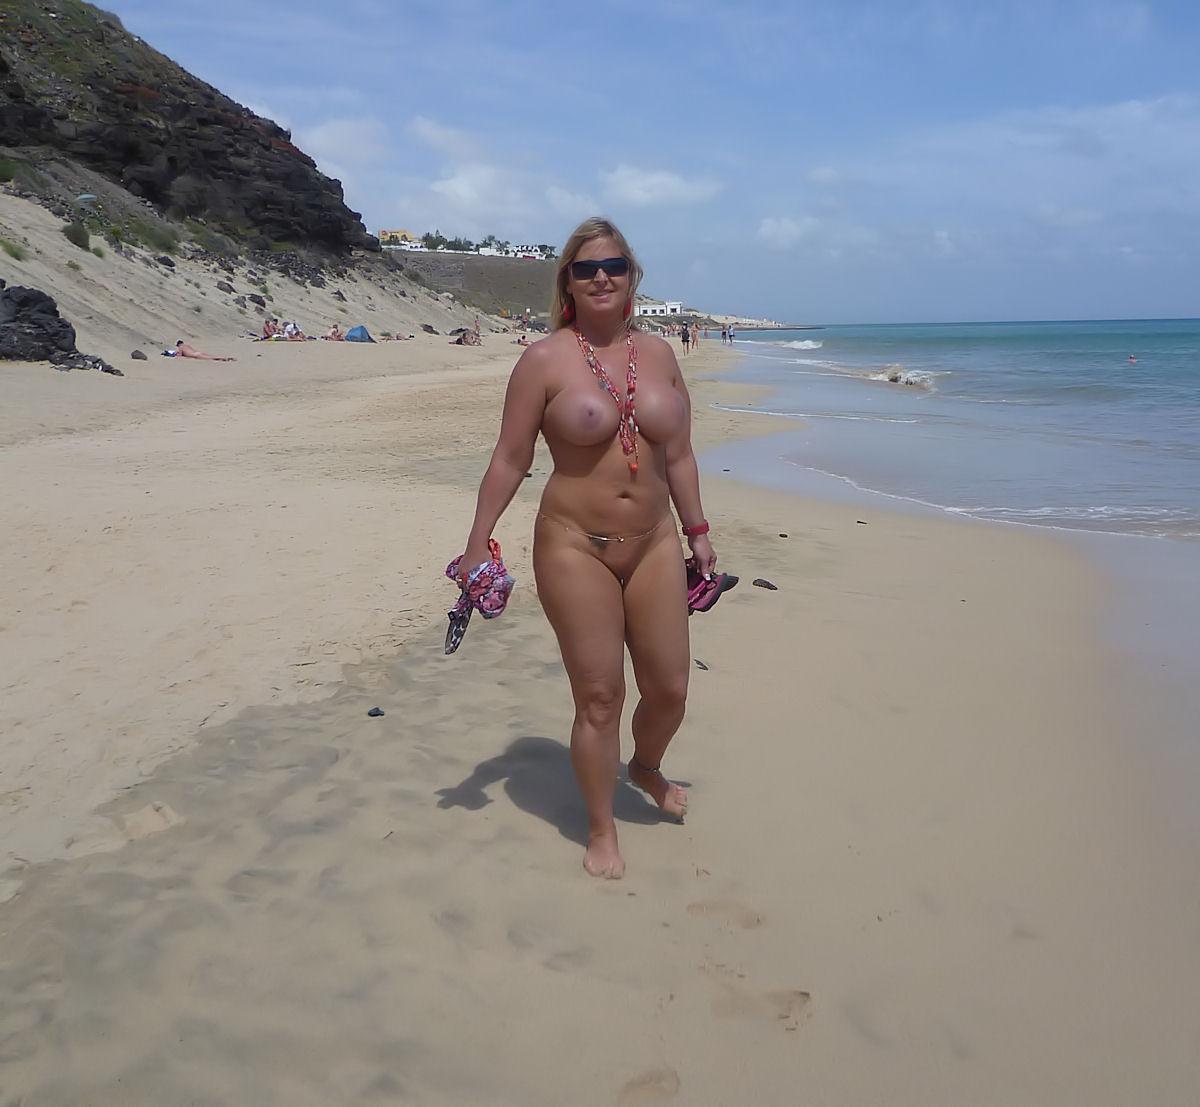 justine shapiro nudist